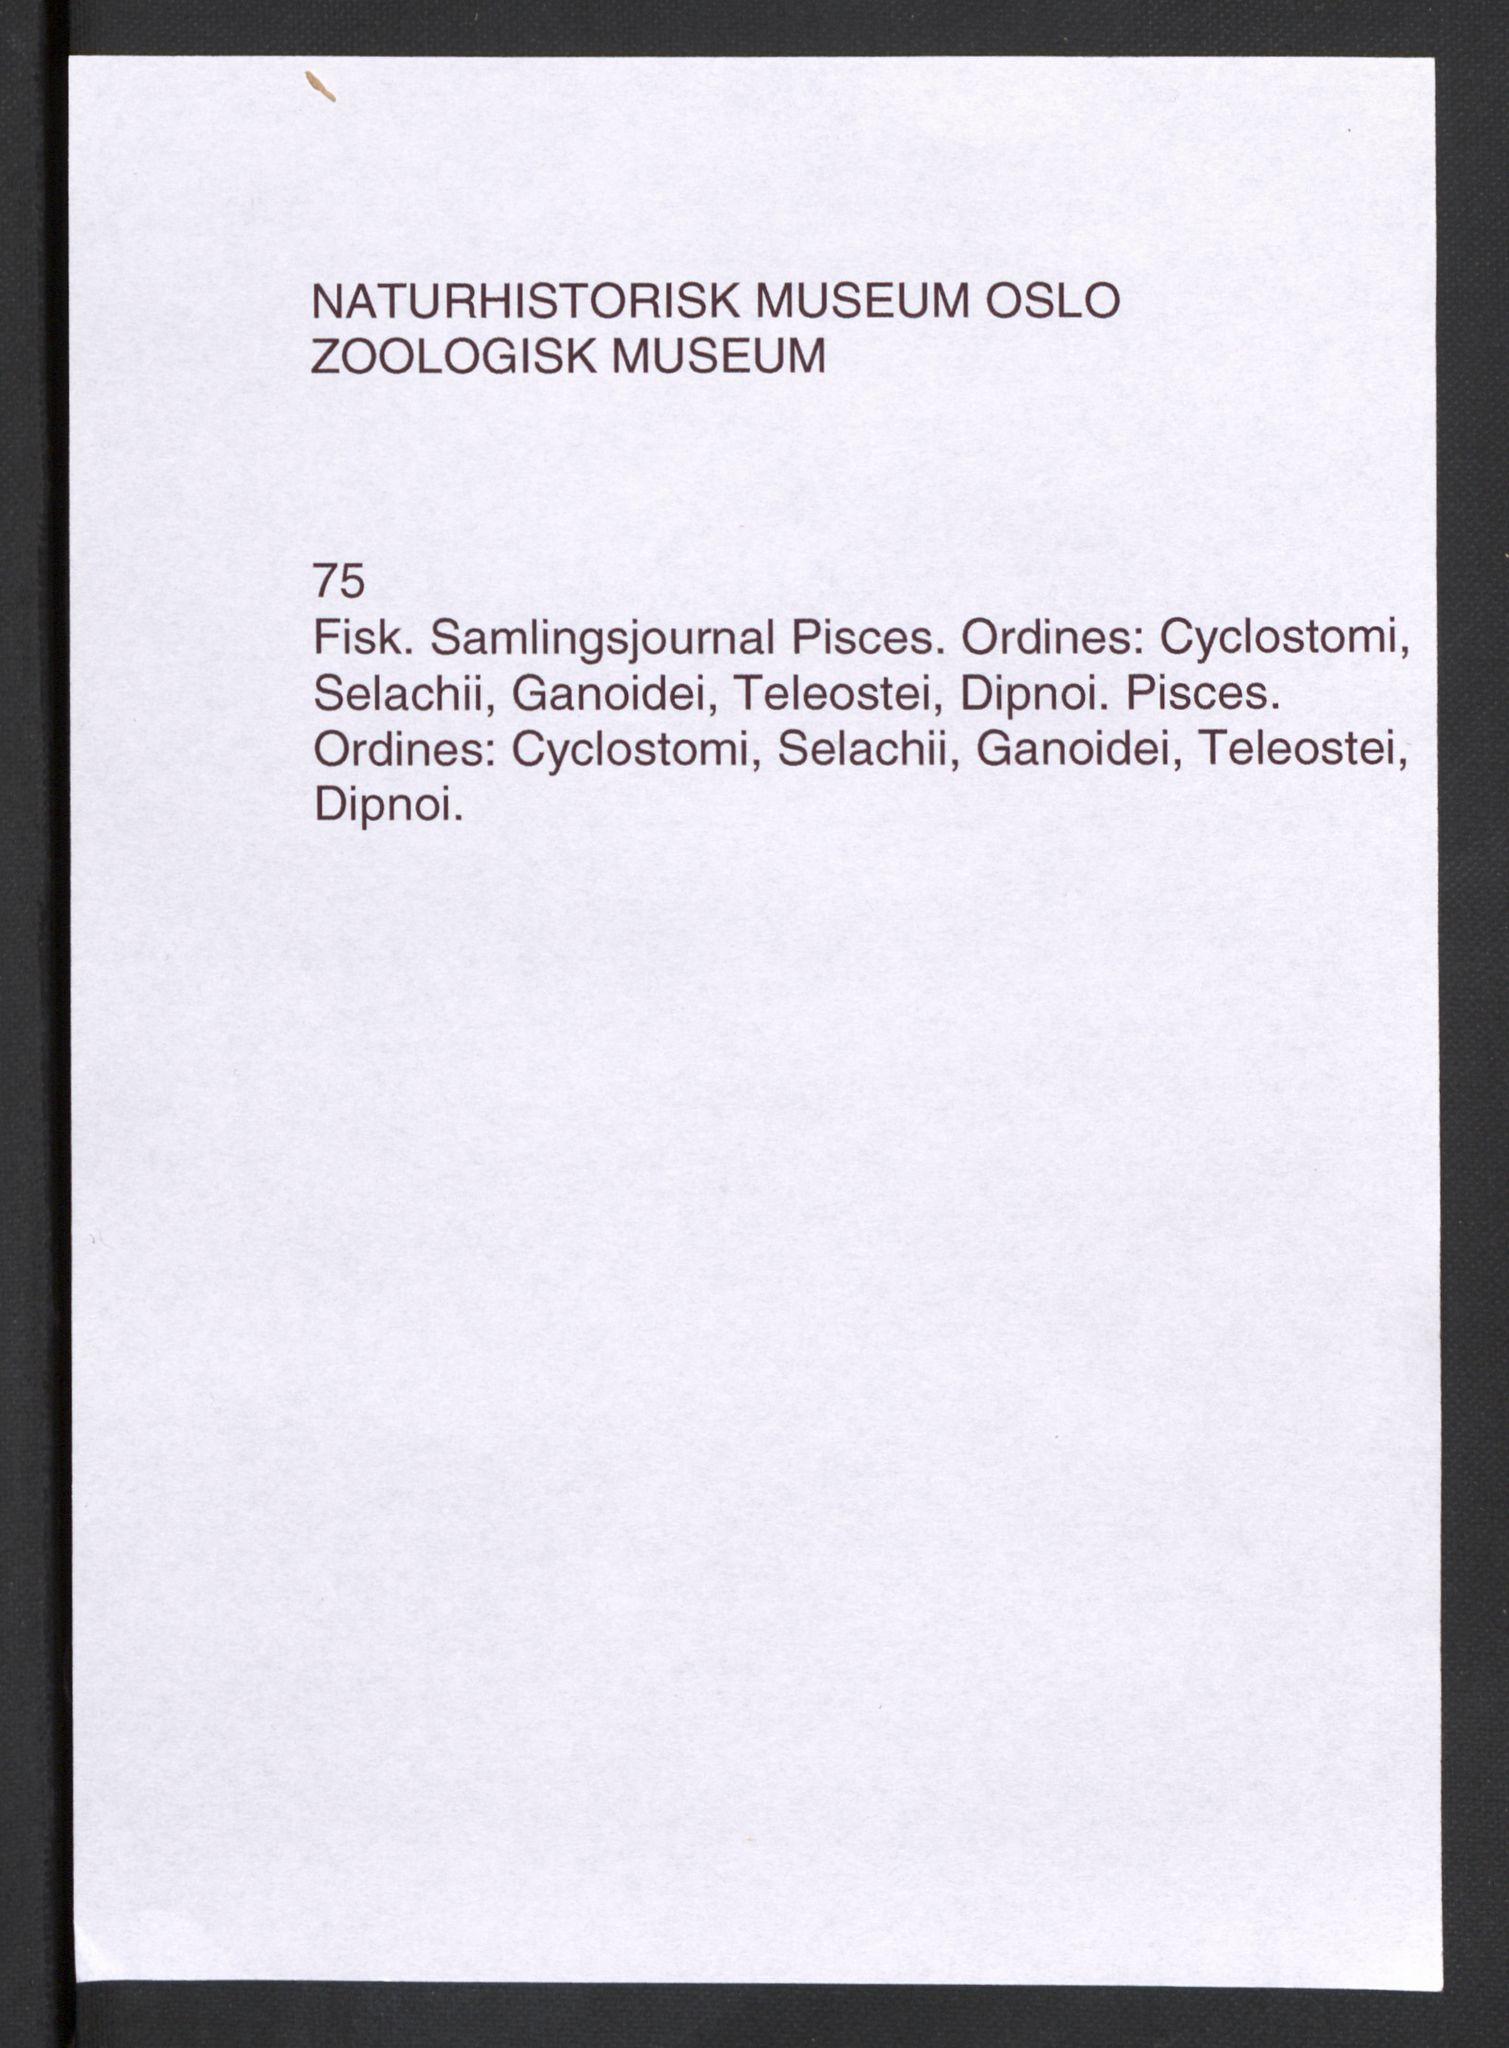 NHMO, Naturhistorisk museum (Oslo), 1: Fisk. Taksonomisk journal. Pisces. Ordines: Cyclostomi, Selachii, Ganoidei, Teleostei, Dipnoi